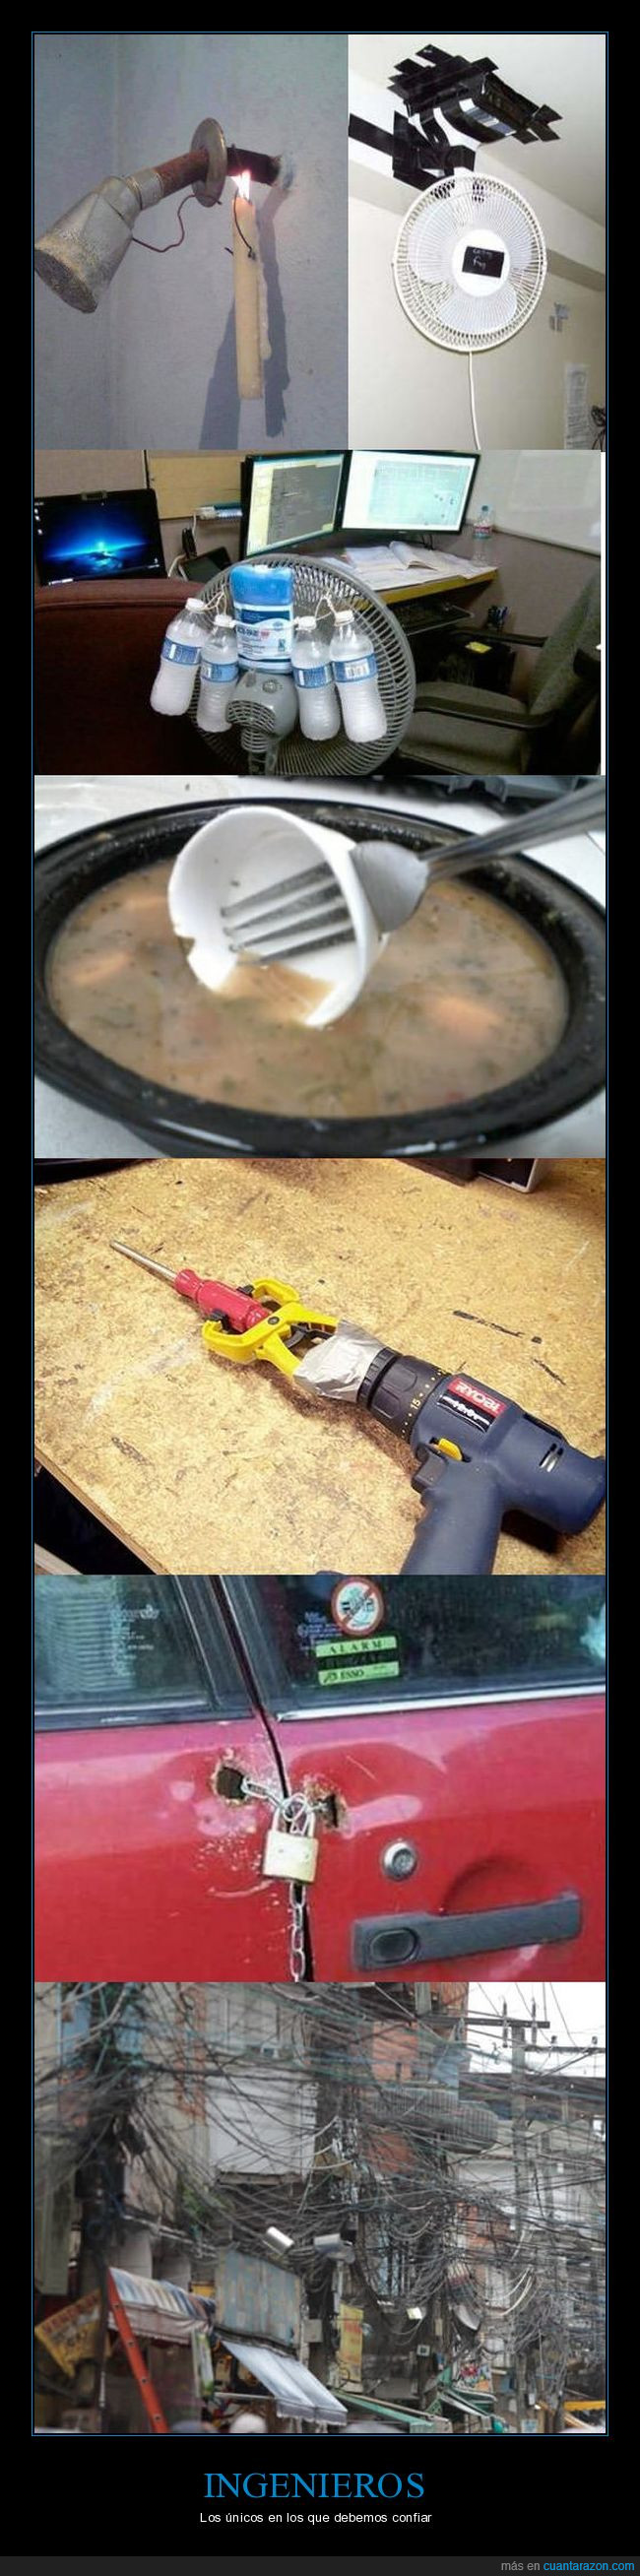 arreglar,chapuzas,ingeniería,ingeniero